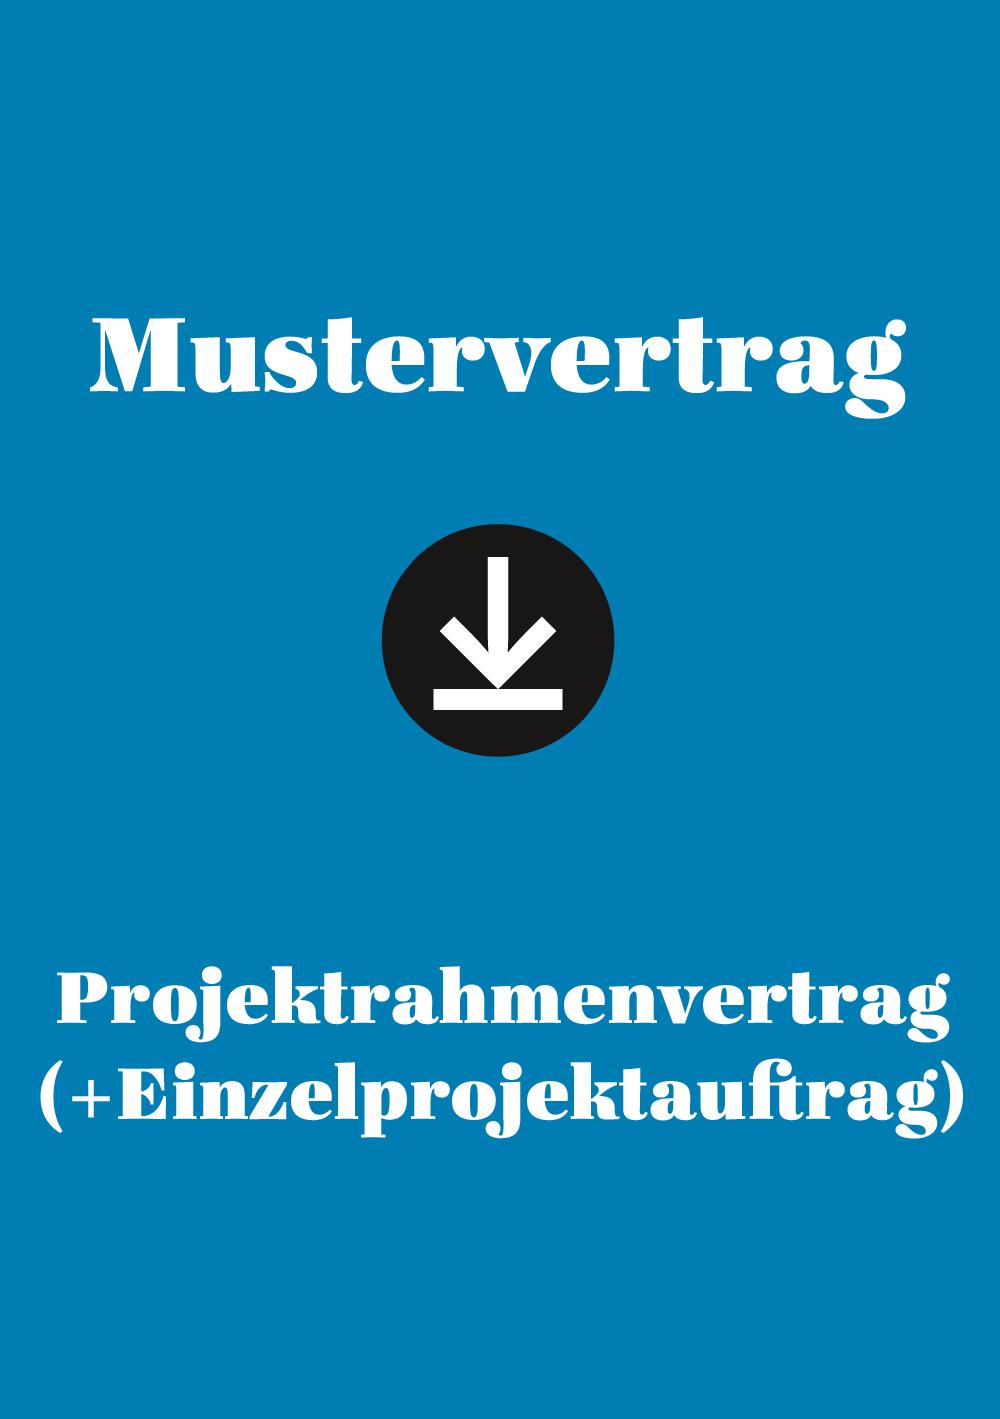 Produkt: Mustervertrag: Projektrahmenvertrag (+Einzelprojektauftrag)